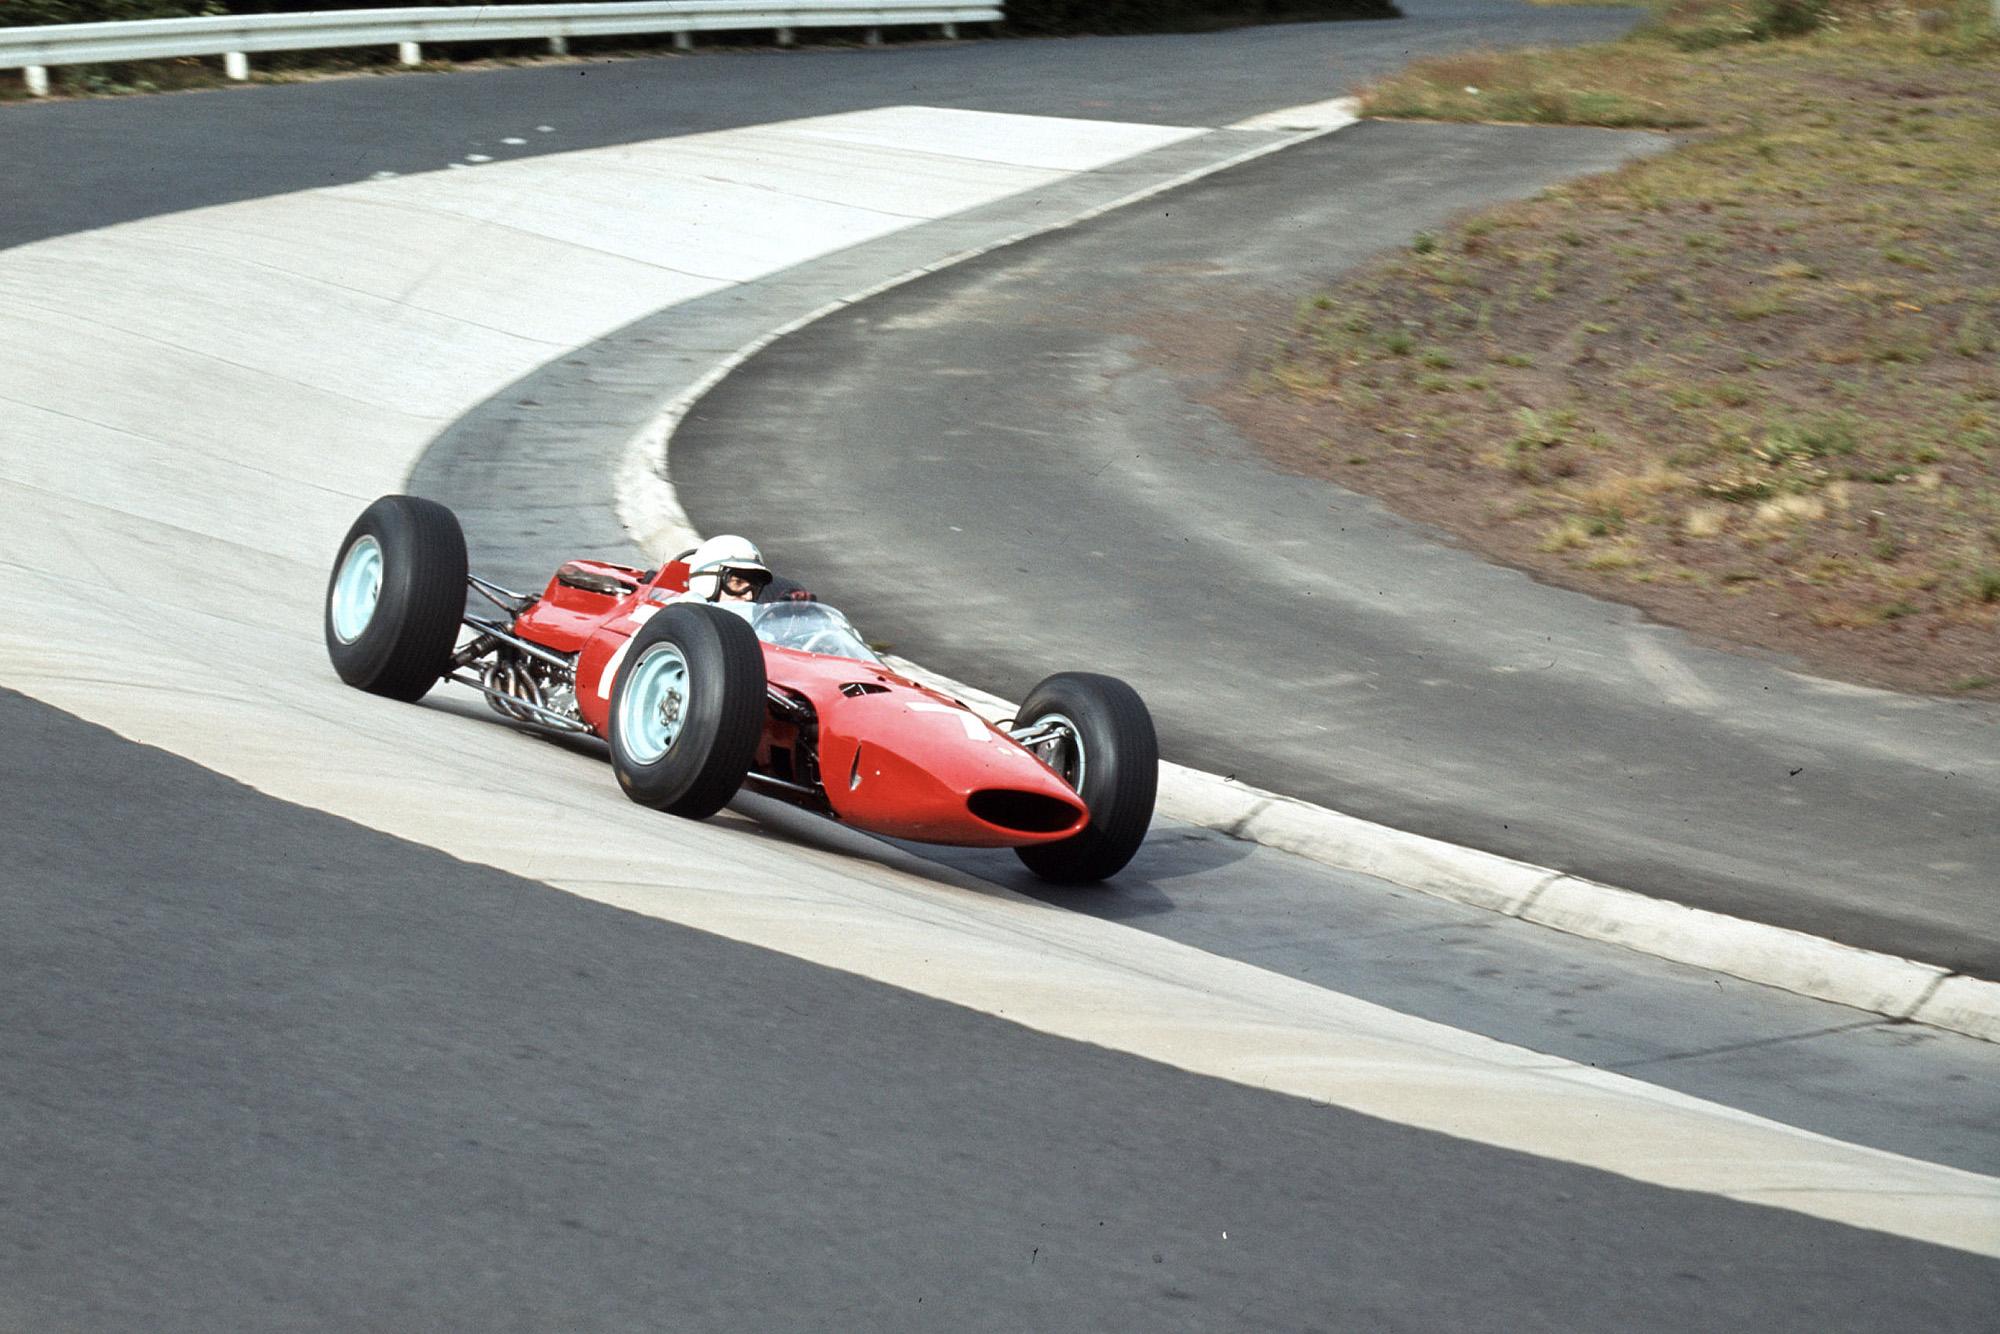 John Surtees (Ferrari 1512) in the Karussel.